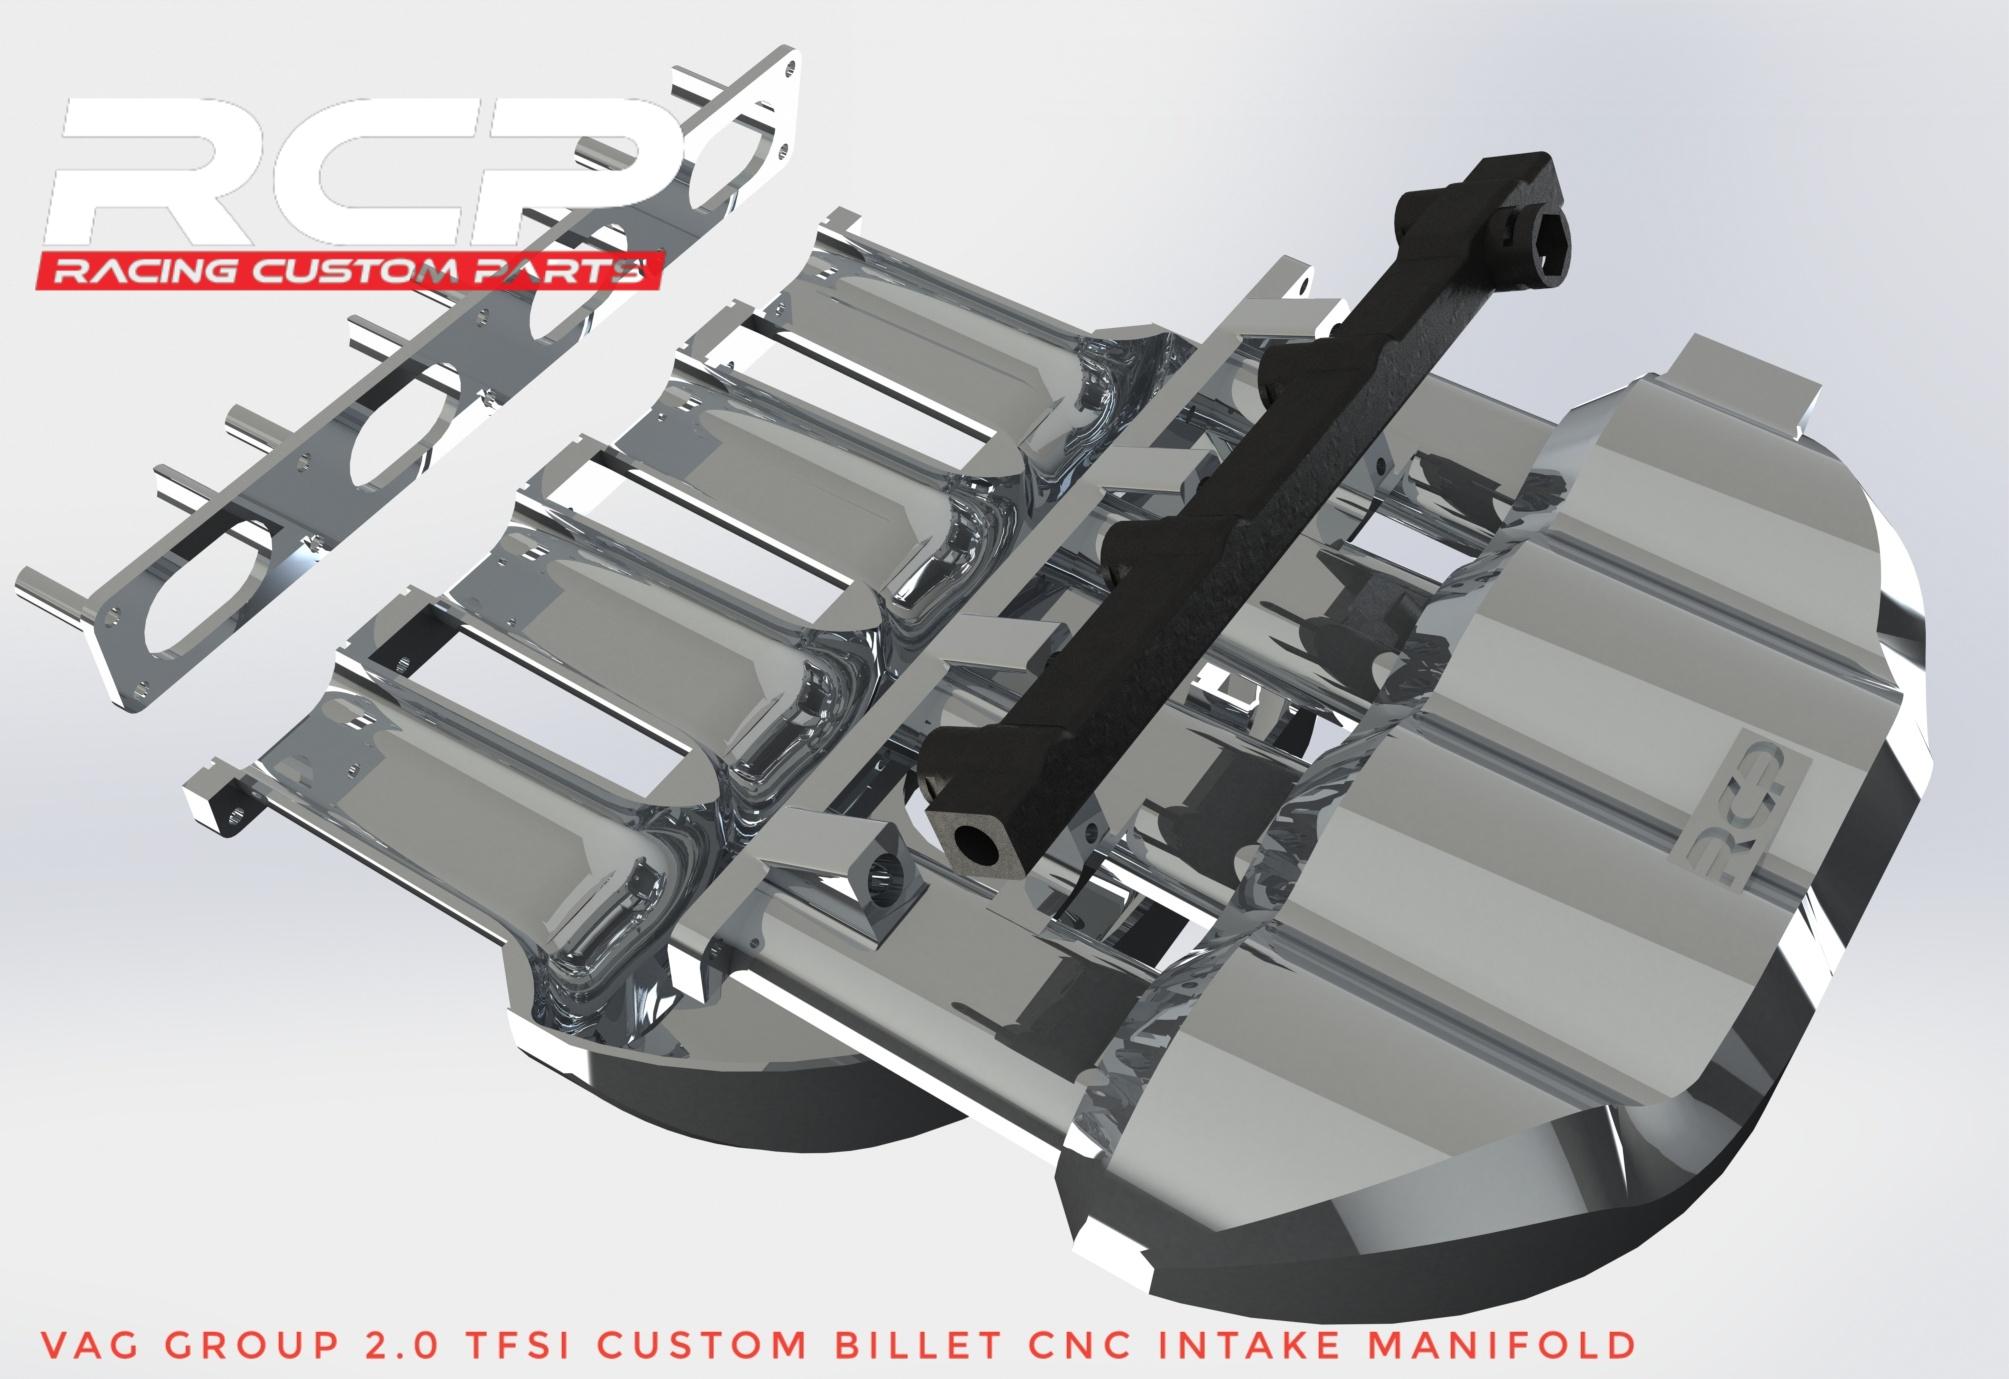 audi vw vag group 2.0tfsi billet cnc intake manifold racing custom parts